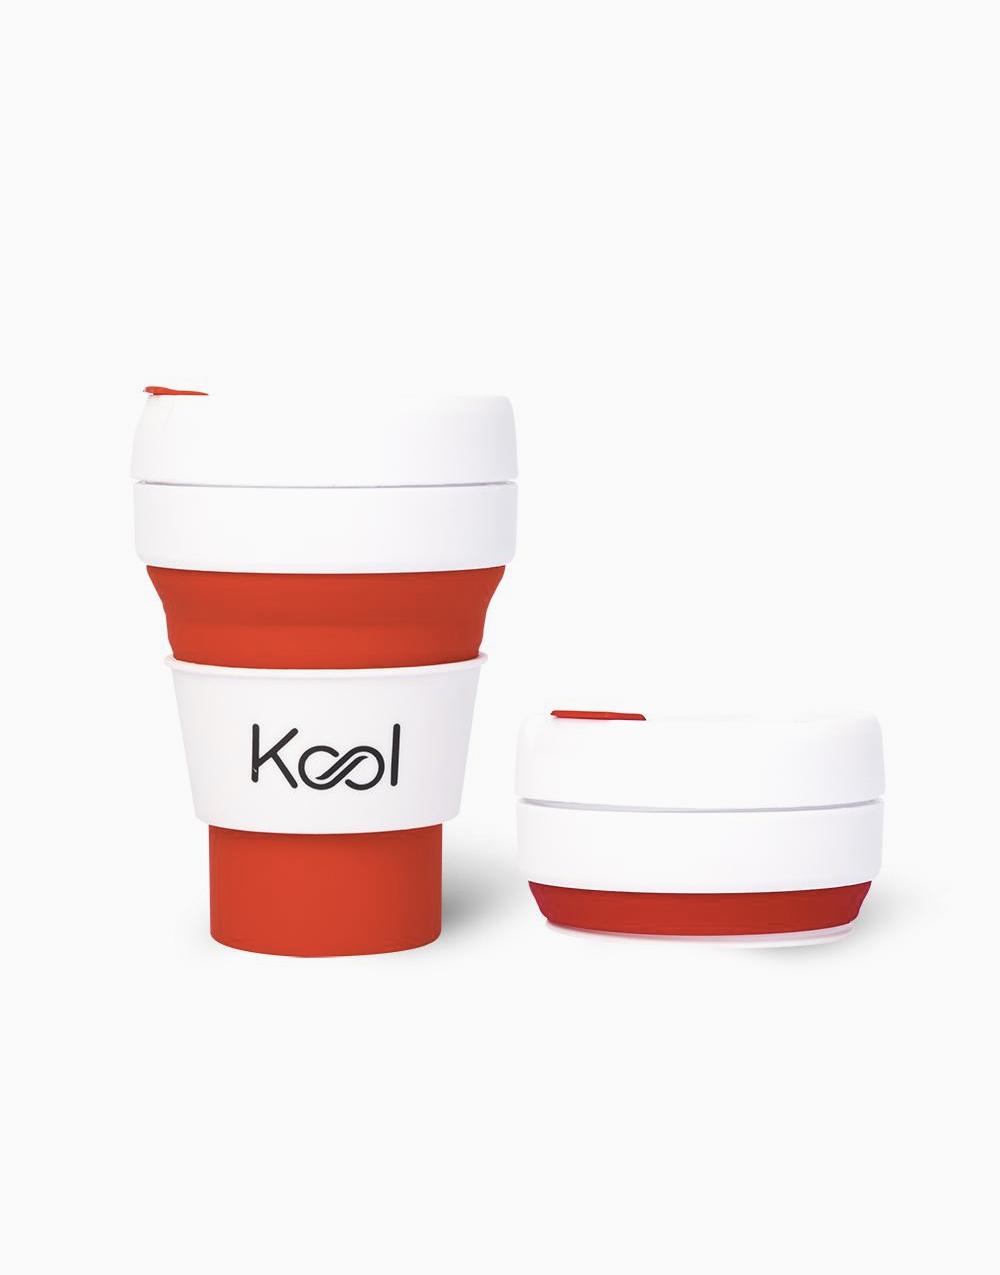 Kool Foldable Cup (355ml) by Kool   Lava